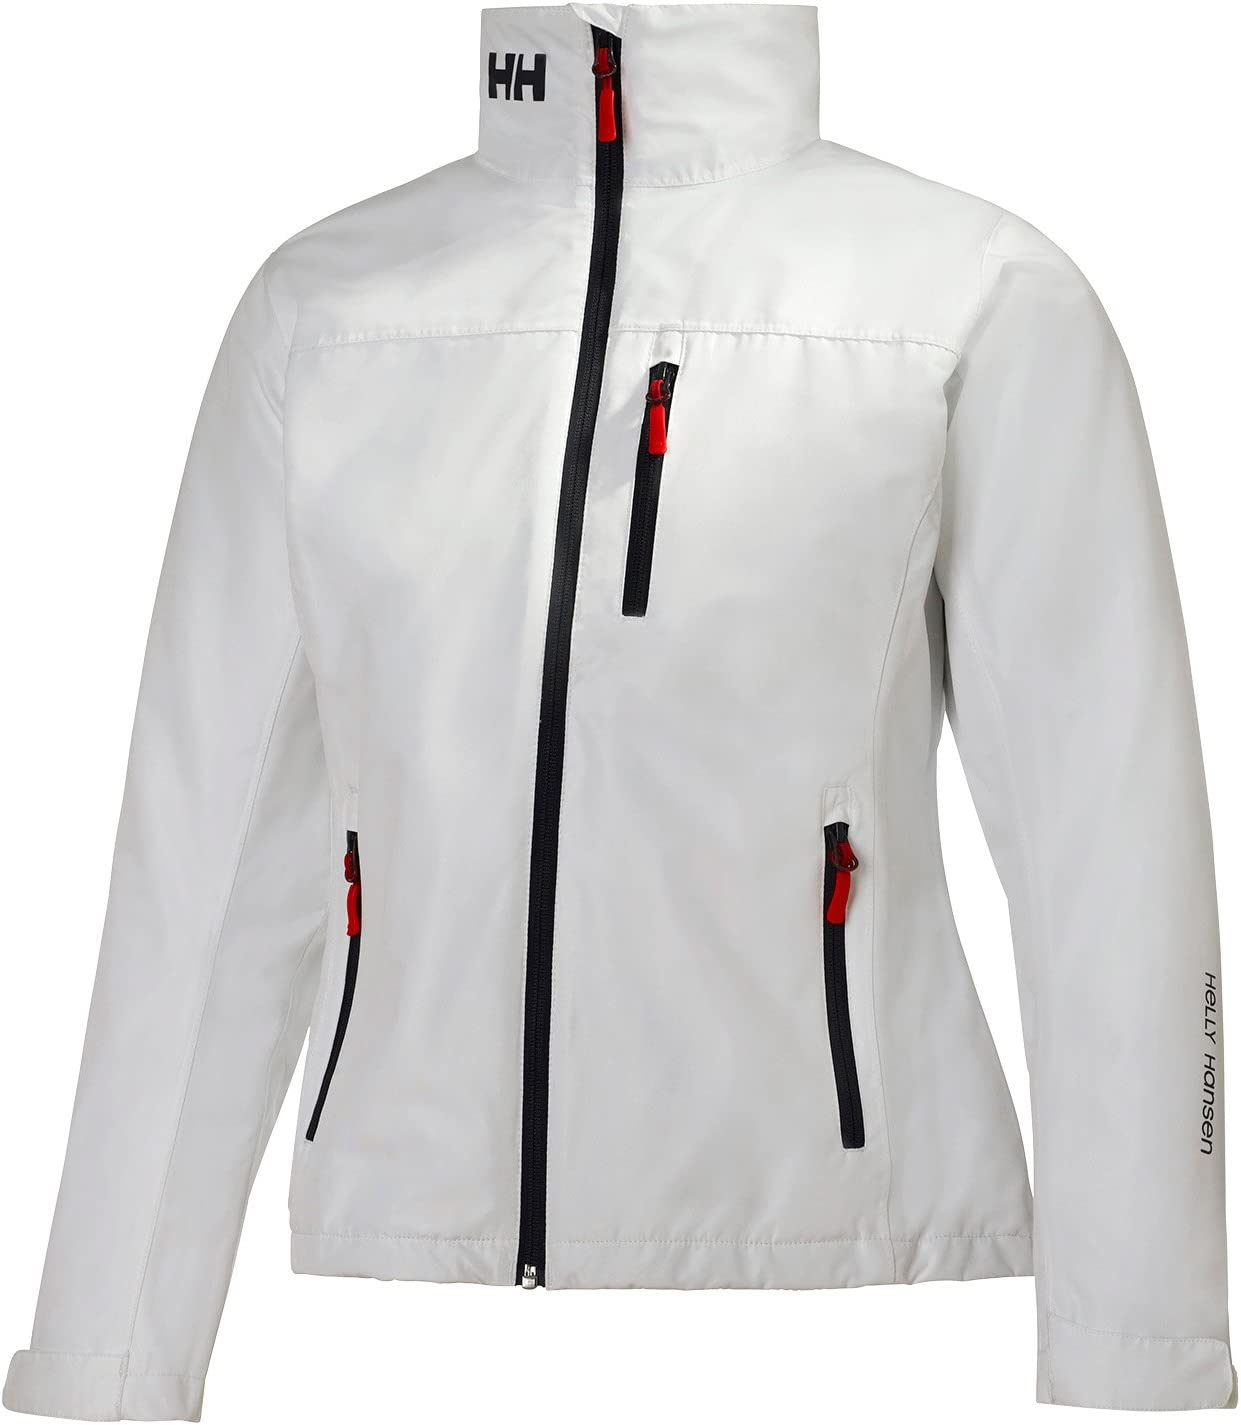 Helly Hansen W Crew Midlayer Jacket Chaqueta deportiva Mujer Pack de 1